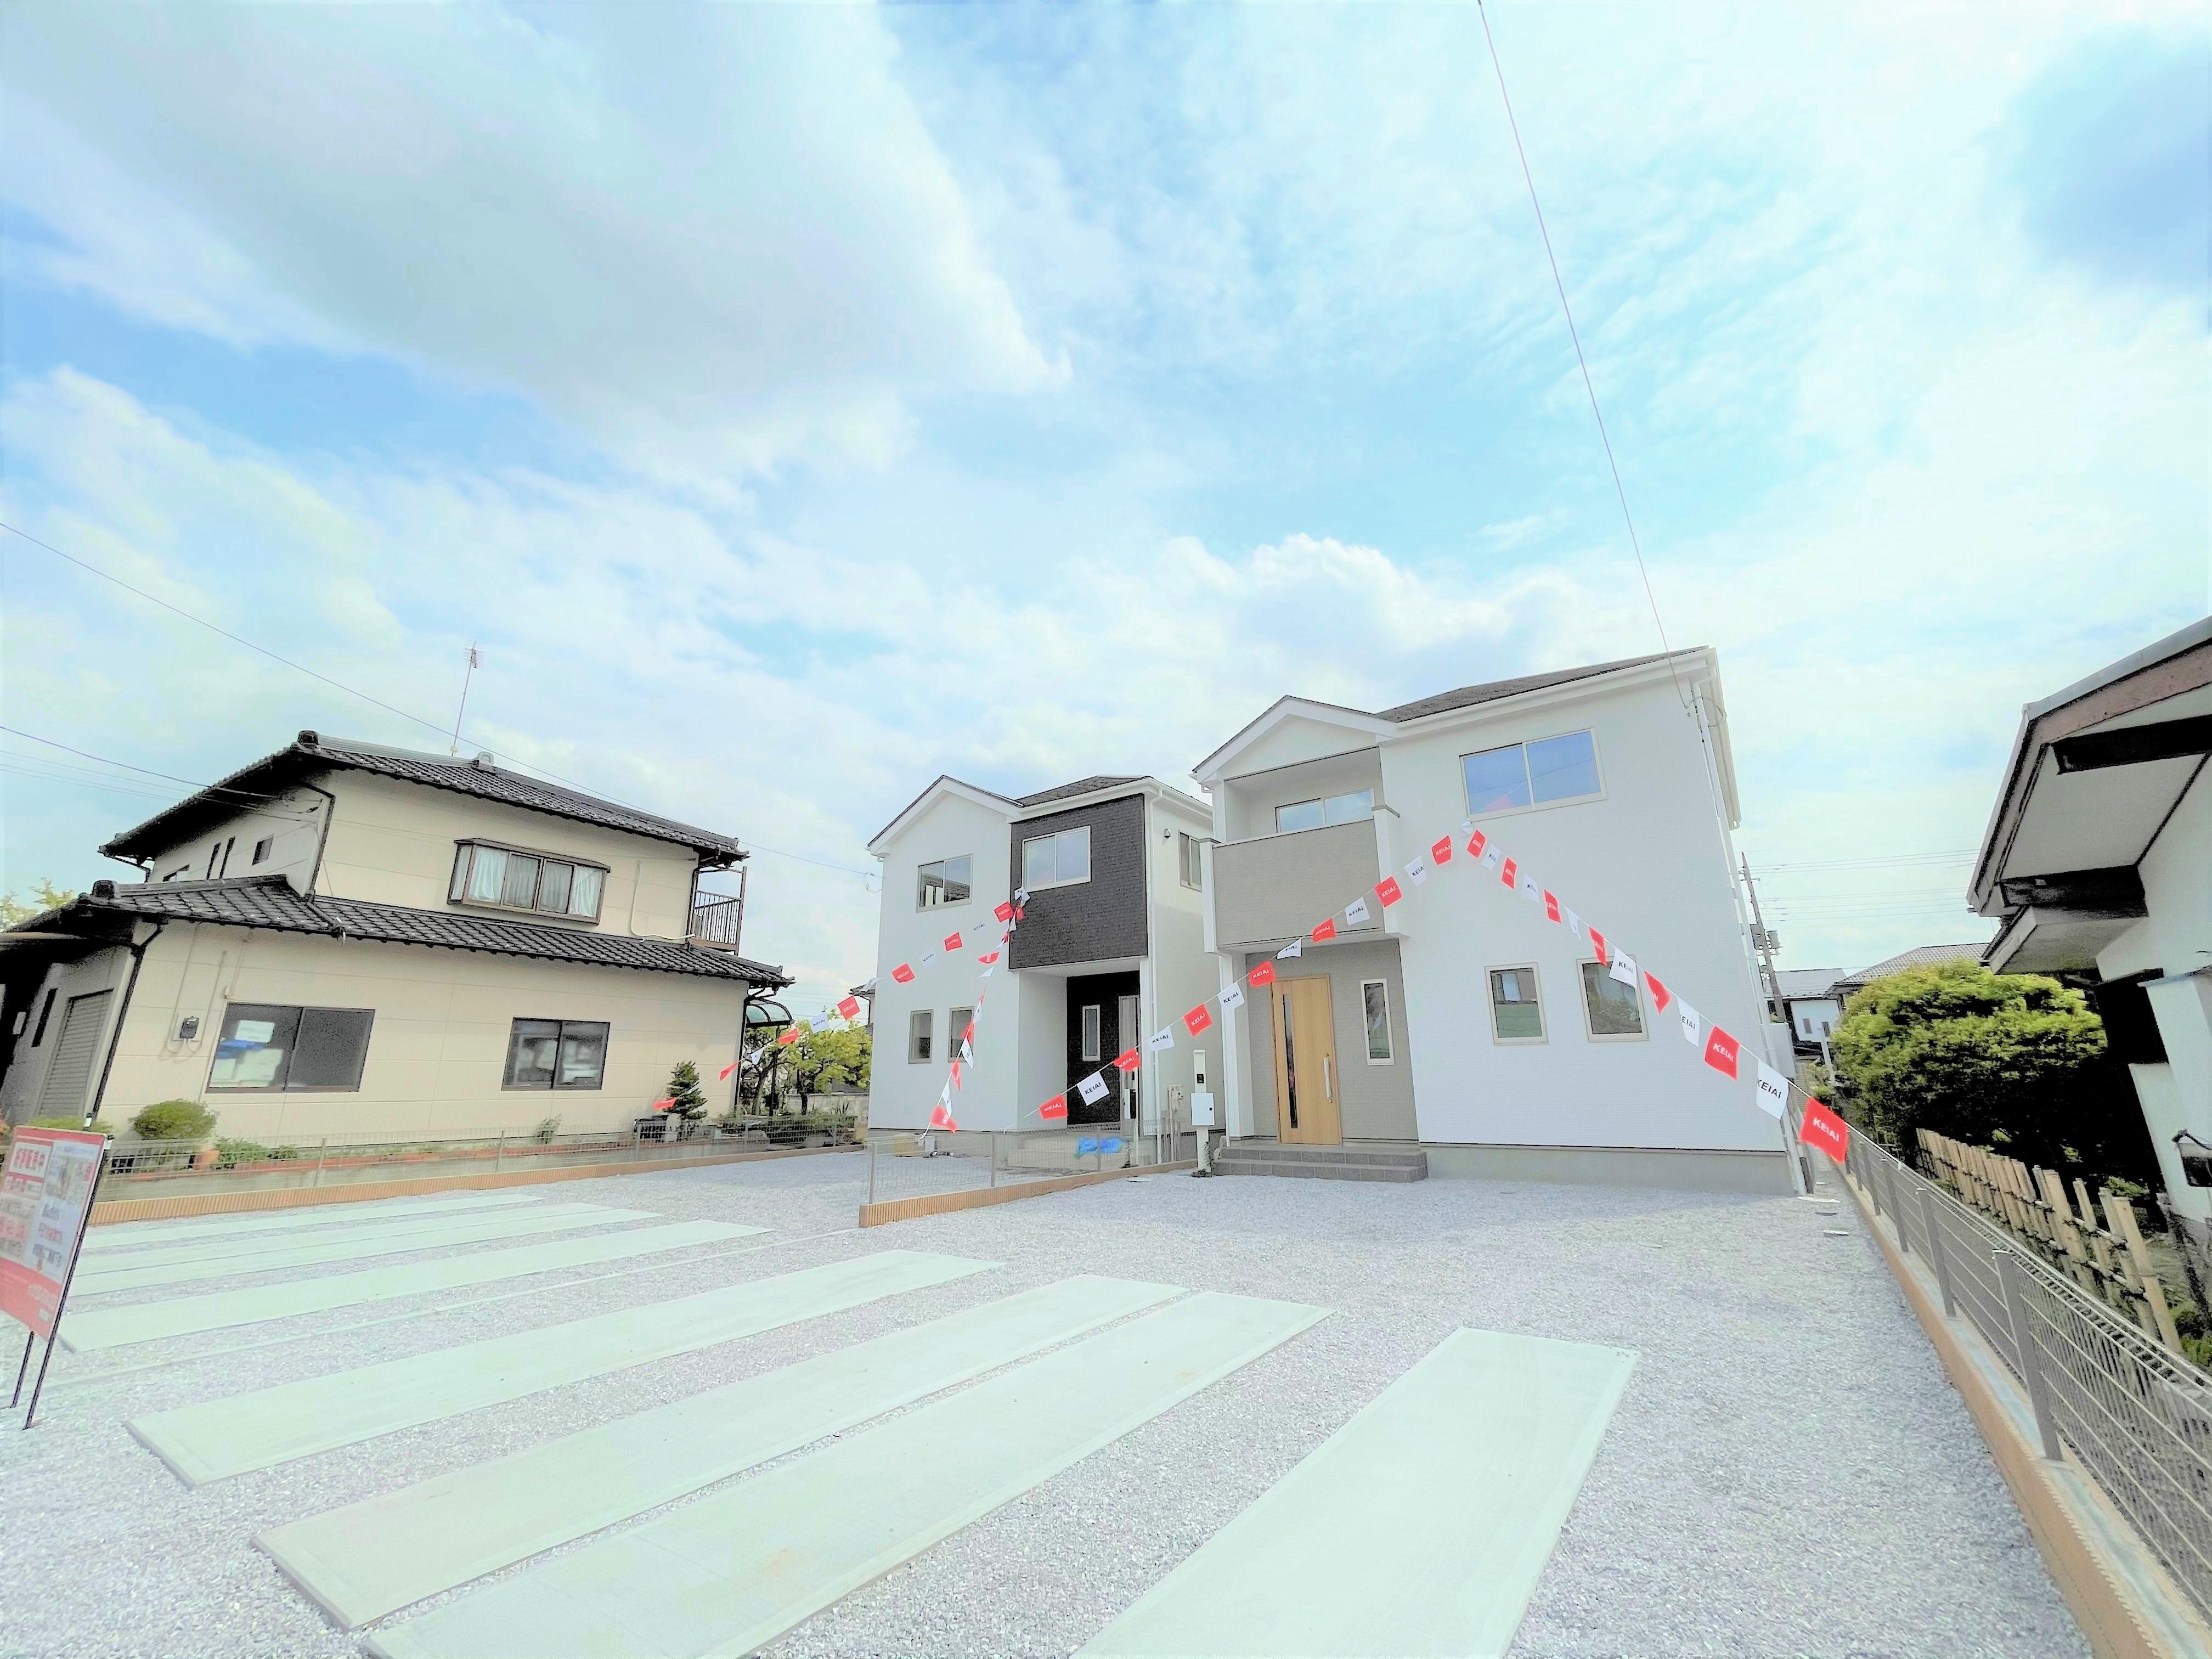 【KEIAI】 - FiT- 東松山市幸町3期◆2号棟 東松山ハウジングセンター